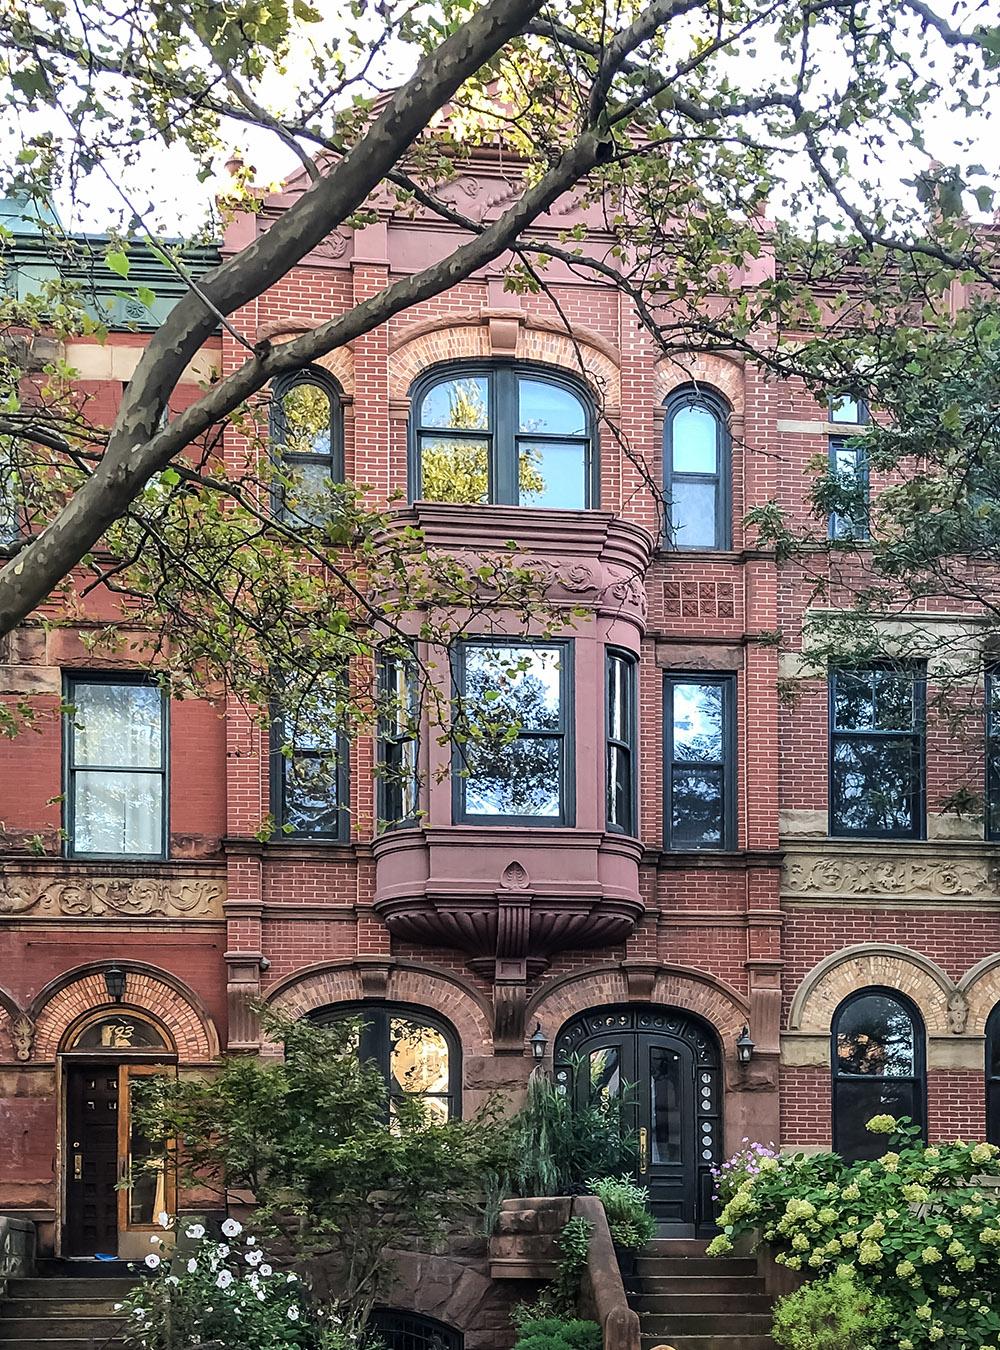 Brooklyn Guide: Lieblingsplätze & Food für die New York Reise